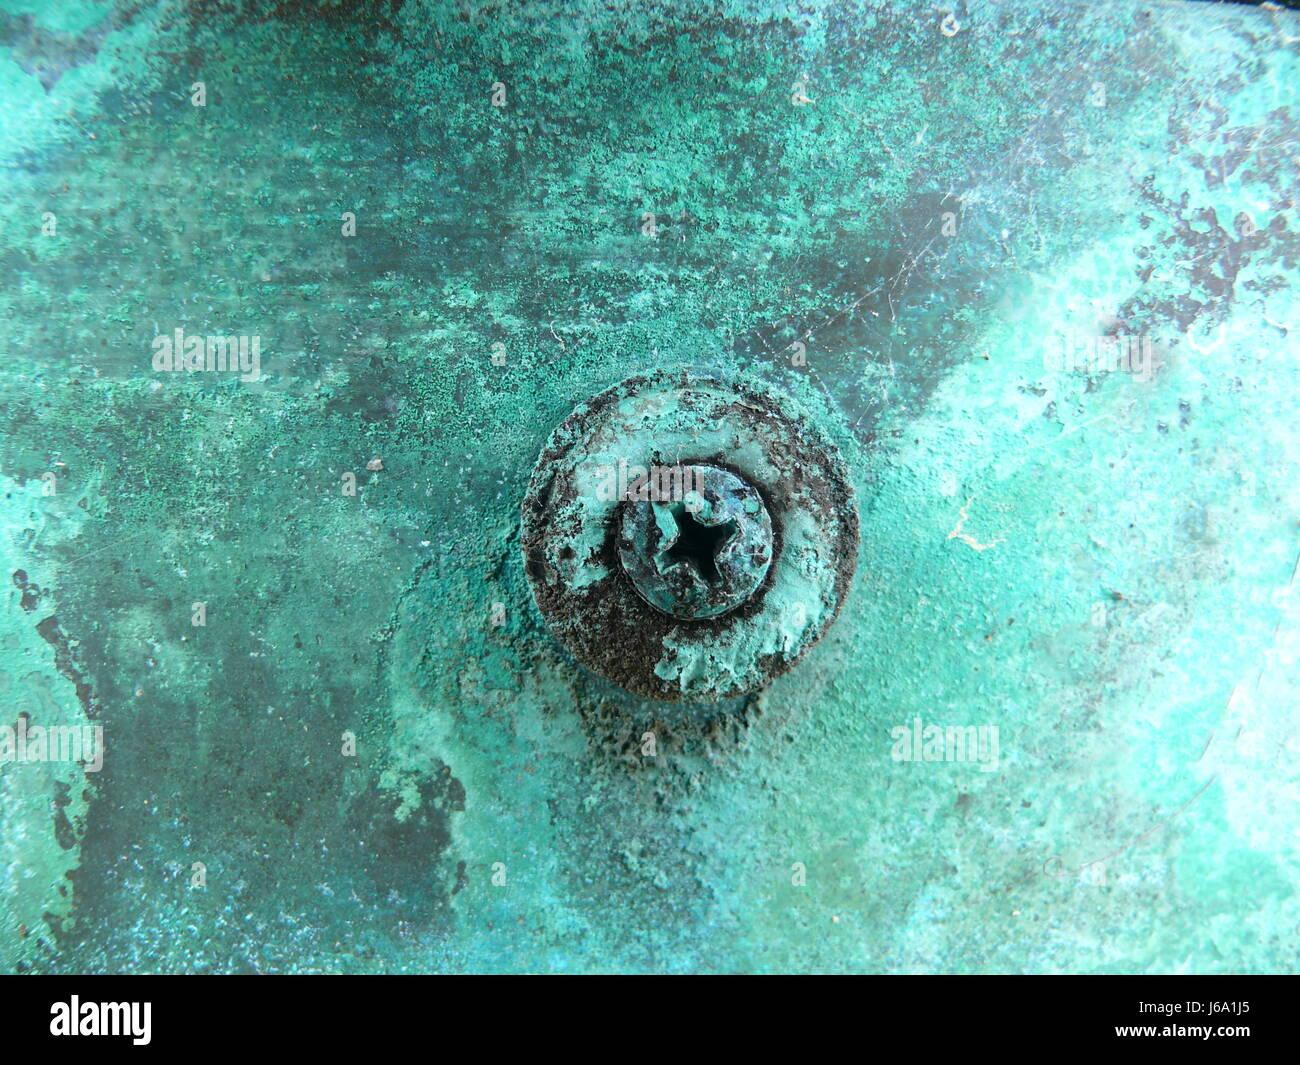 Kupfer Grüne Patina grüne patina kupfer legierung struktur glanz strahlt helles lucent